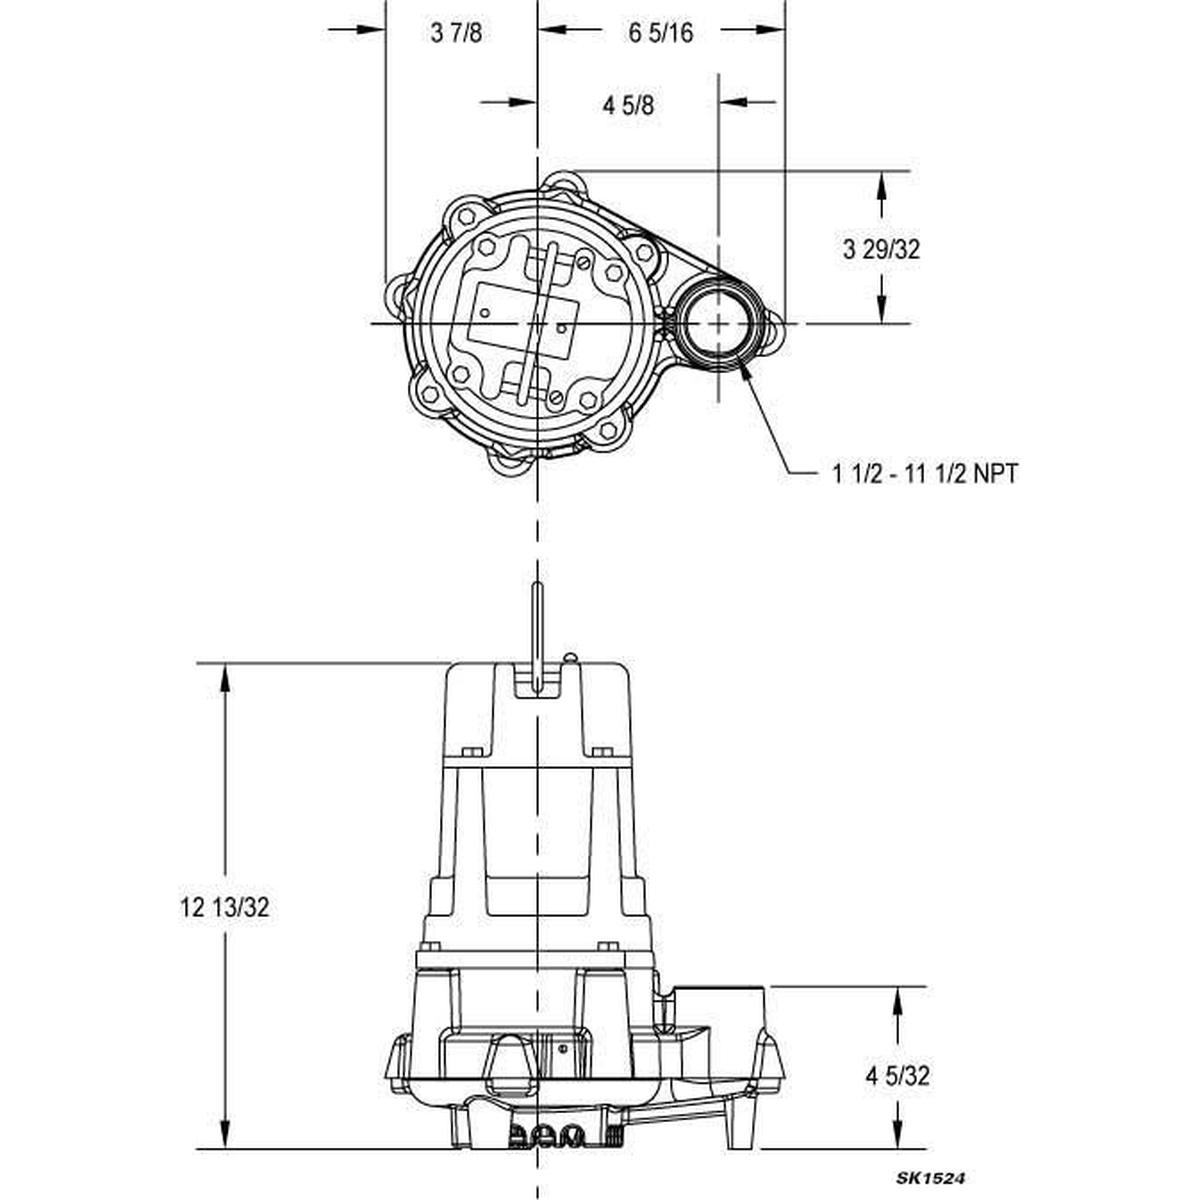 hight resolution of zoeller submersible sump pump 1 hp input horsepower auto intermittent motor duty class cast iron 1 phase 115v ac gamut